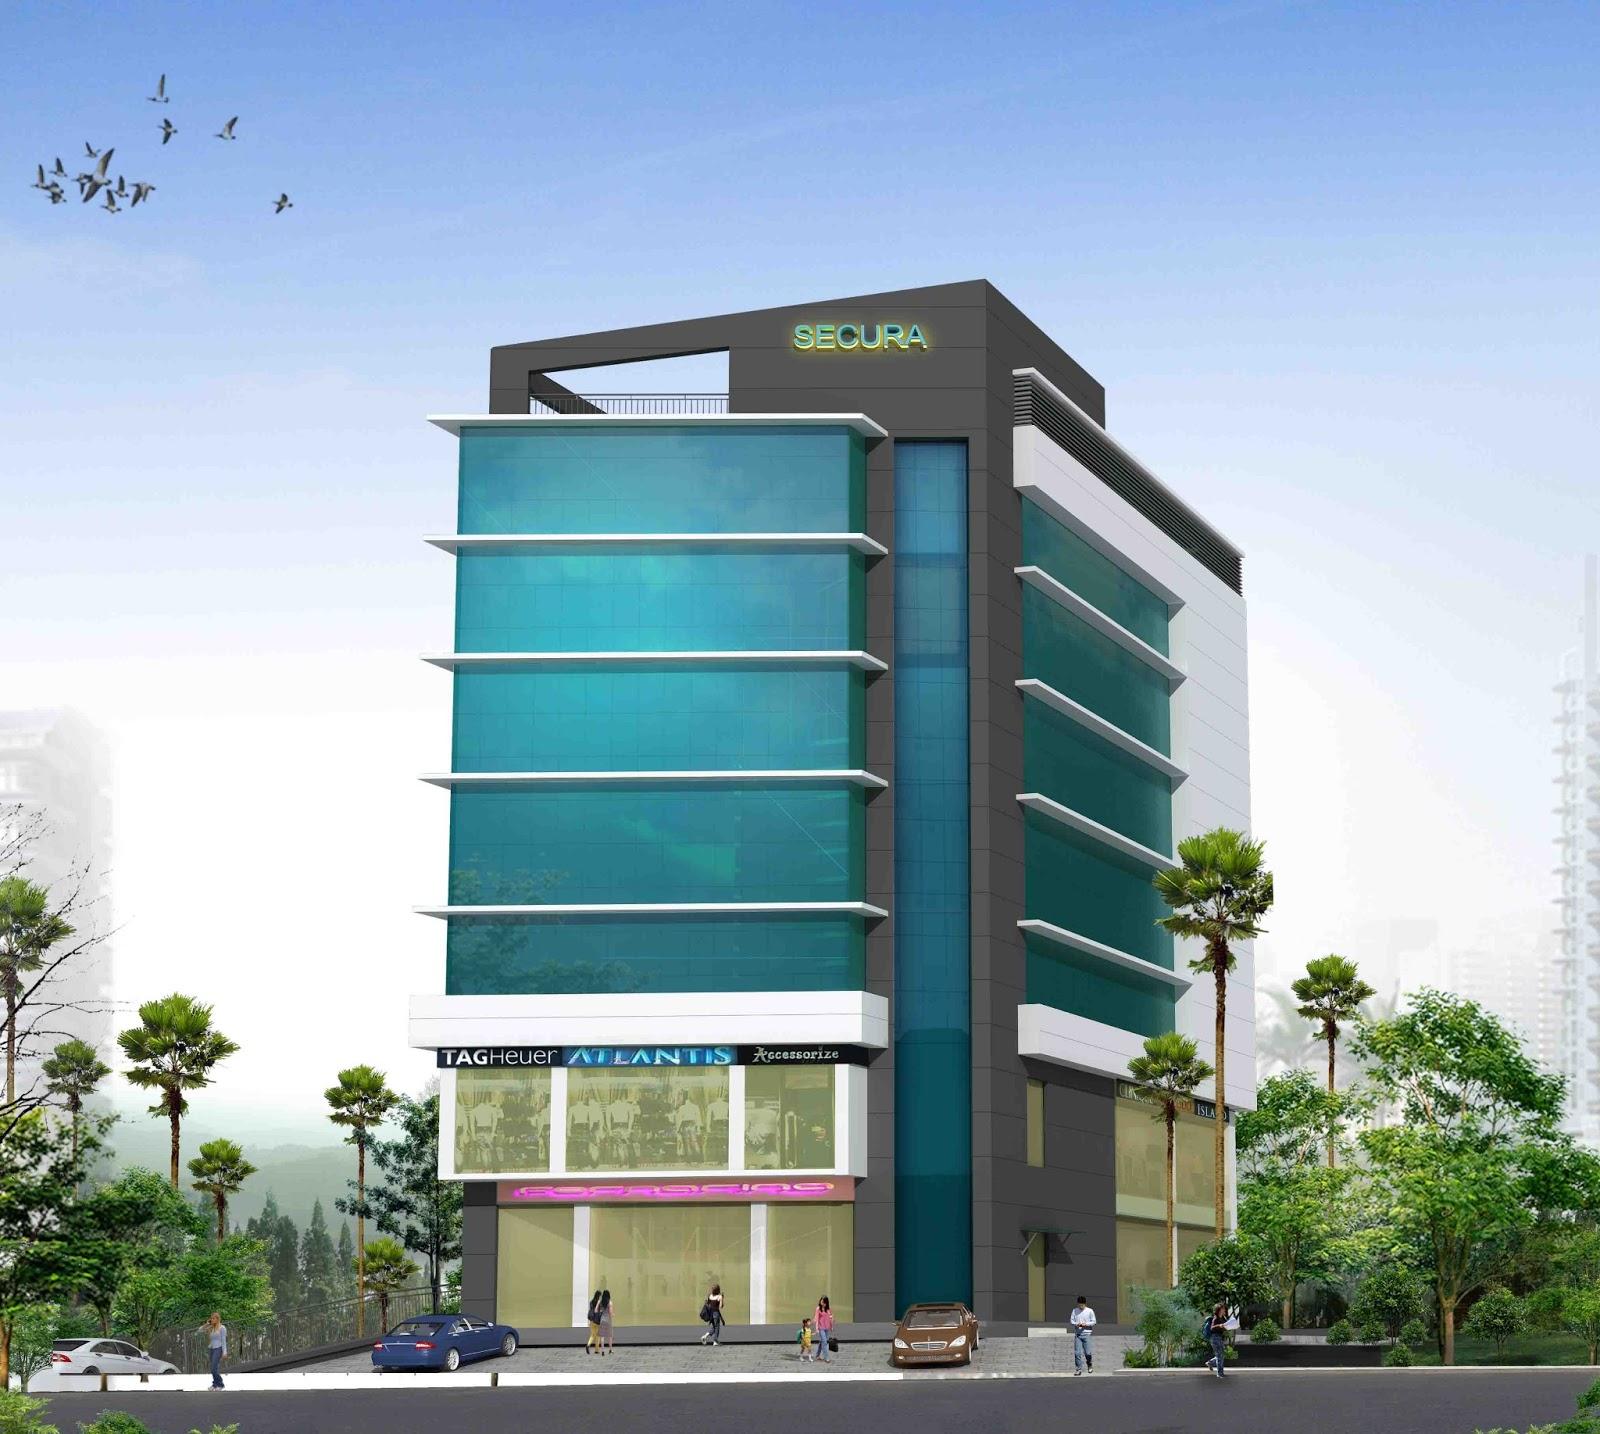 Secura Investment Management Pvt Ltd, Kozhikode (Calicut